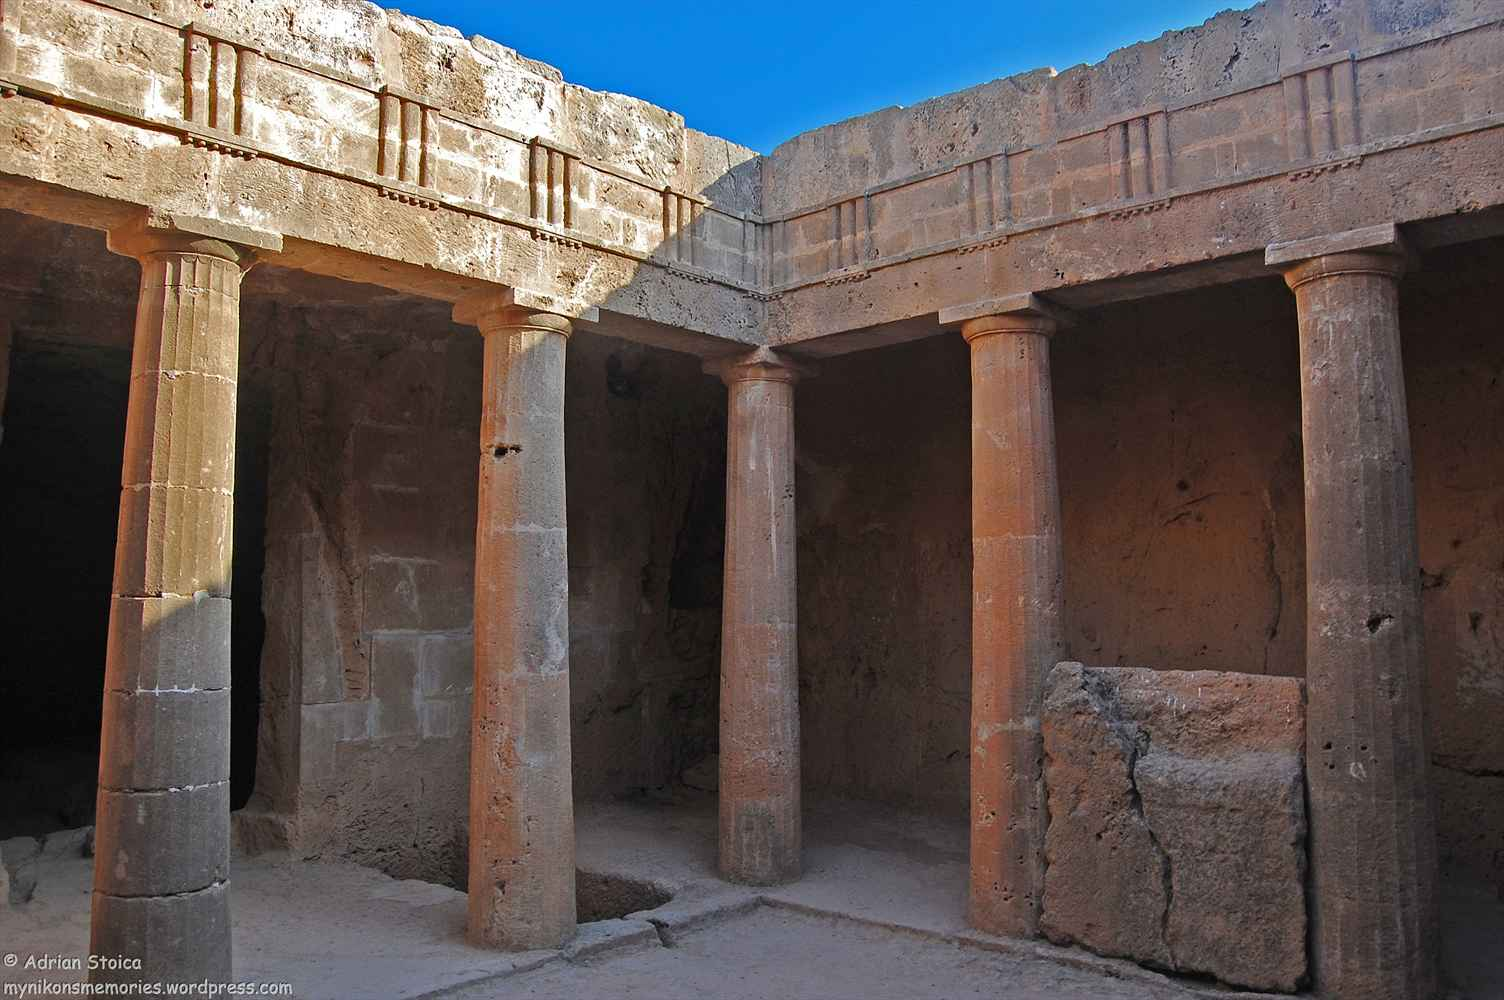 Cipru, o altfel de Grecie – Mormintele Regilor